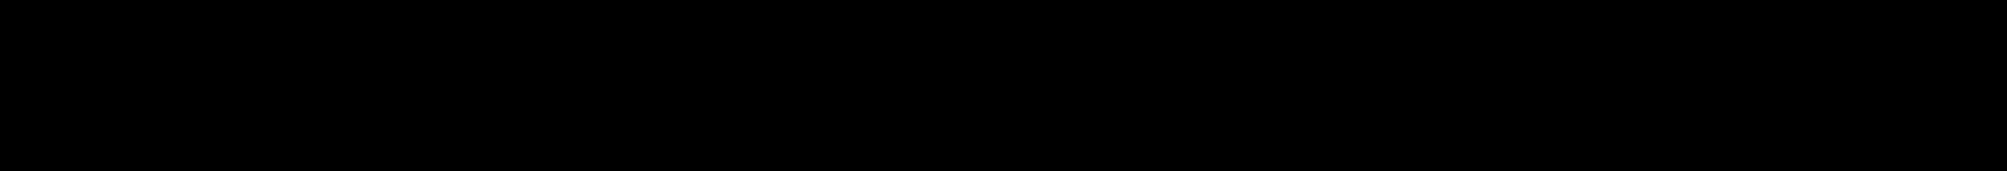 Etch A Sketch Fonts Fontspace